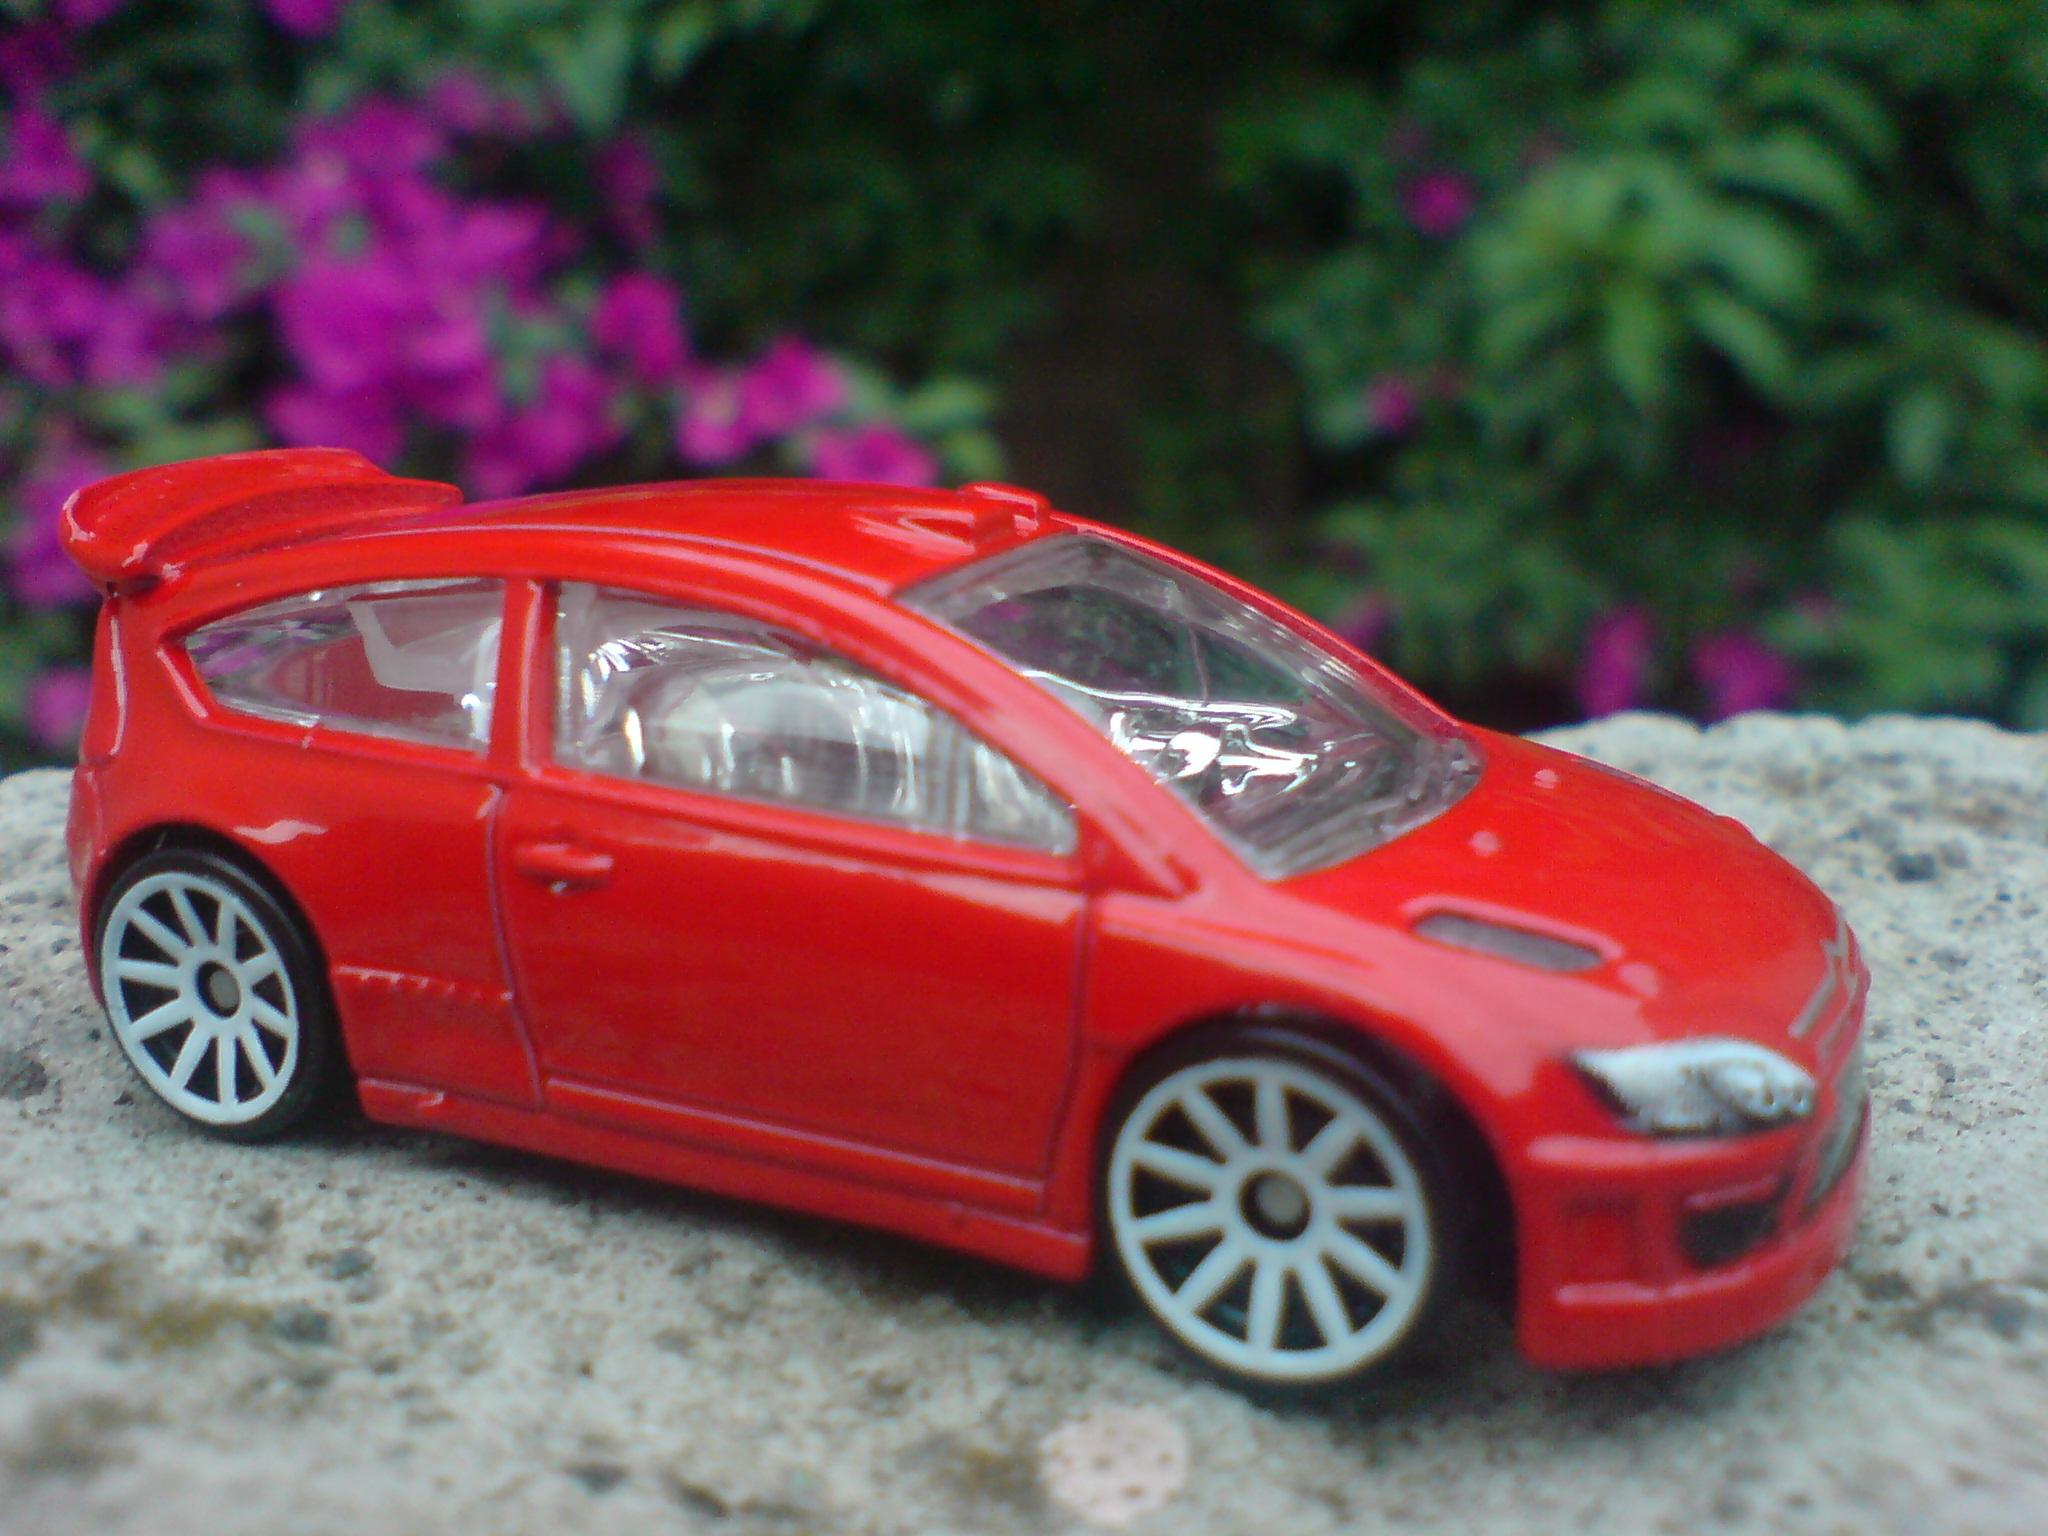 Citroën C4 Rally